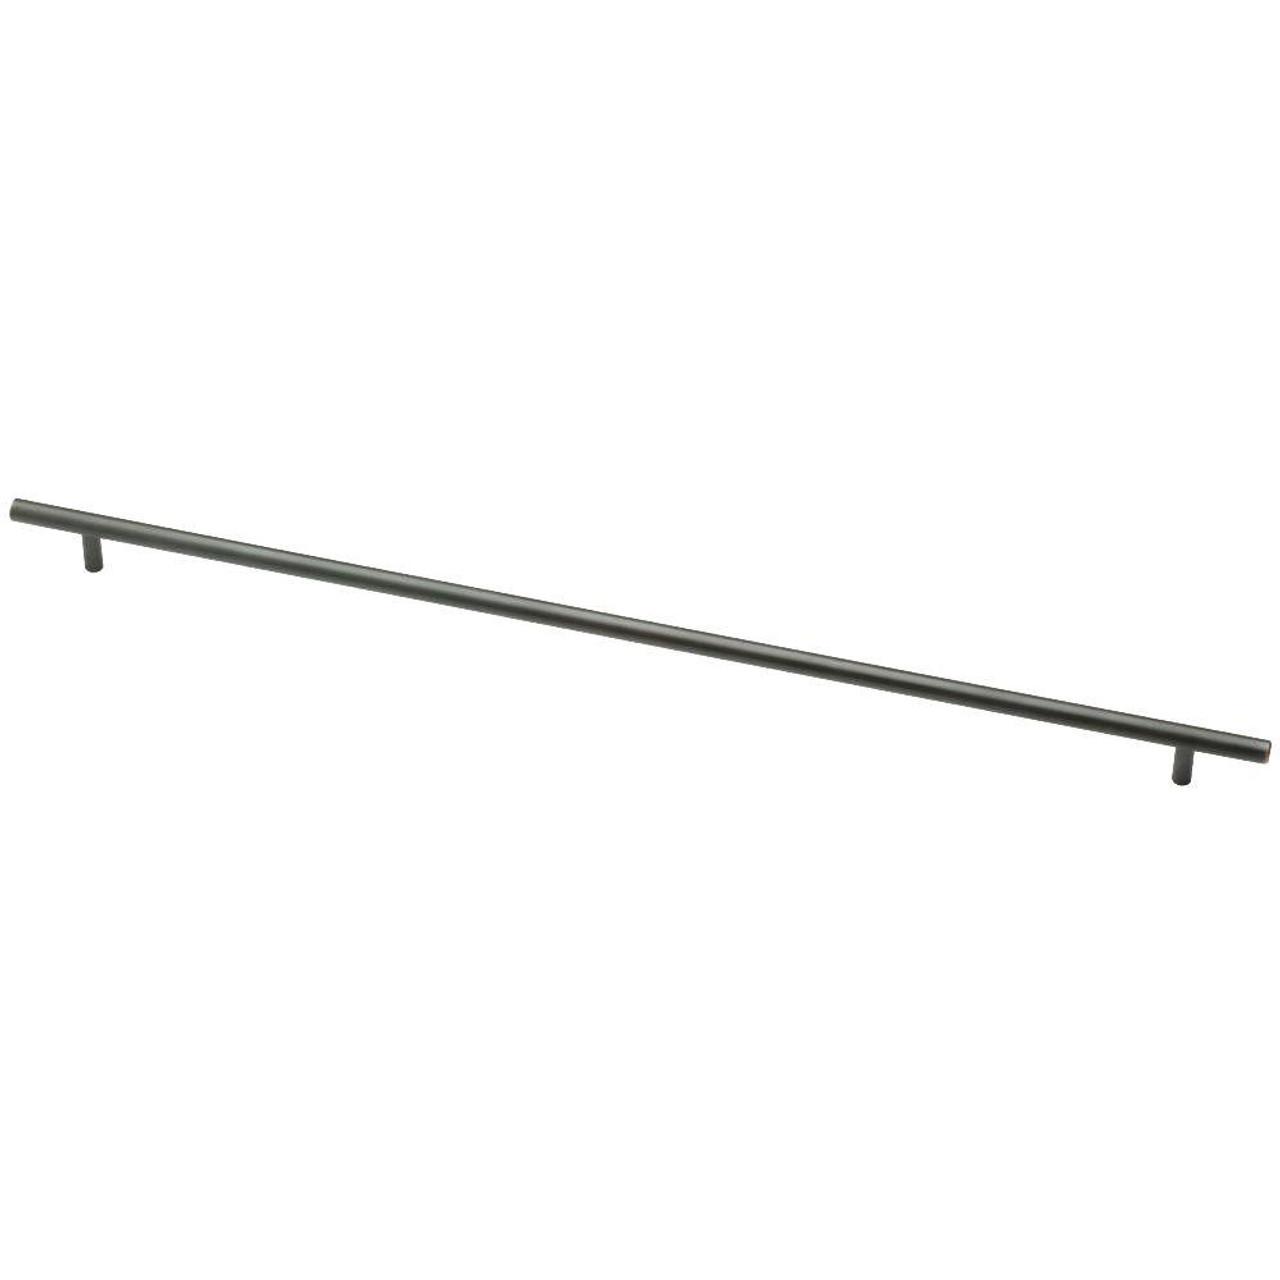 "Avante 65544VB 21 3/8"" CTC Venetian Bronze Pull Bar Design Drawer Pull Knob"